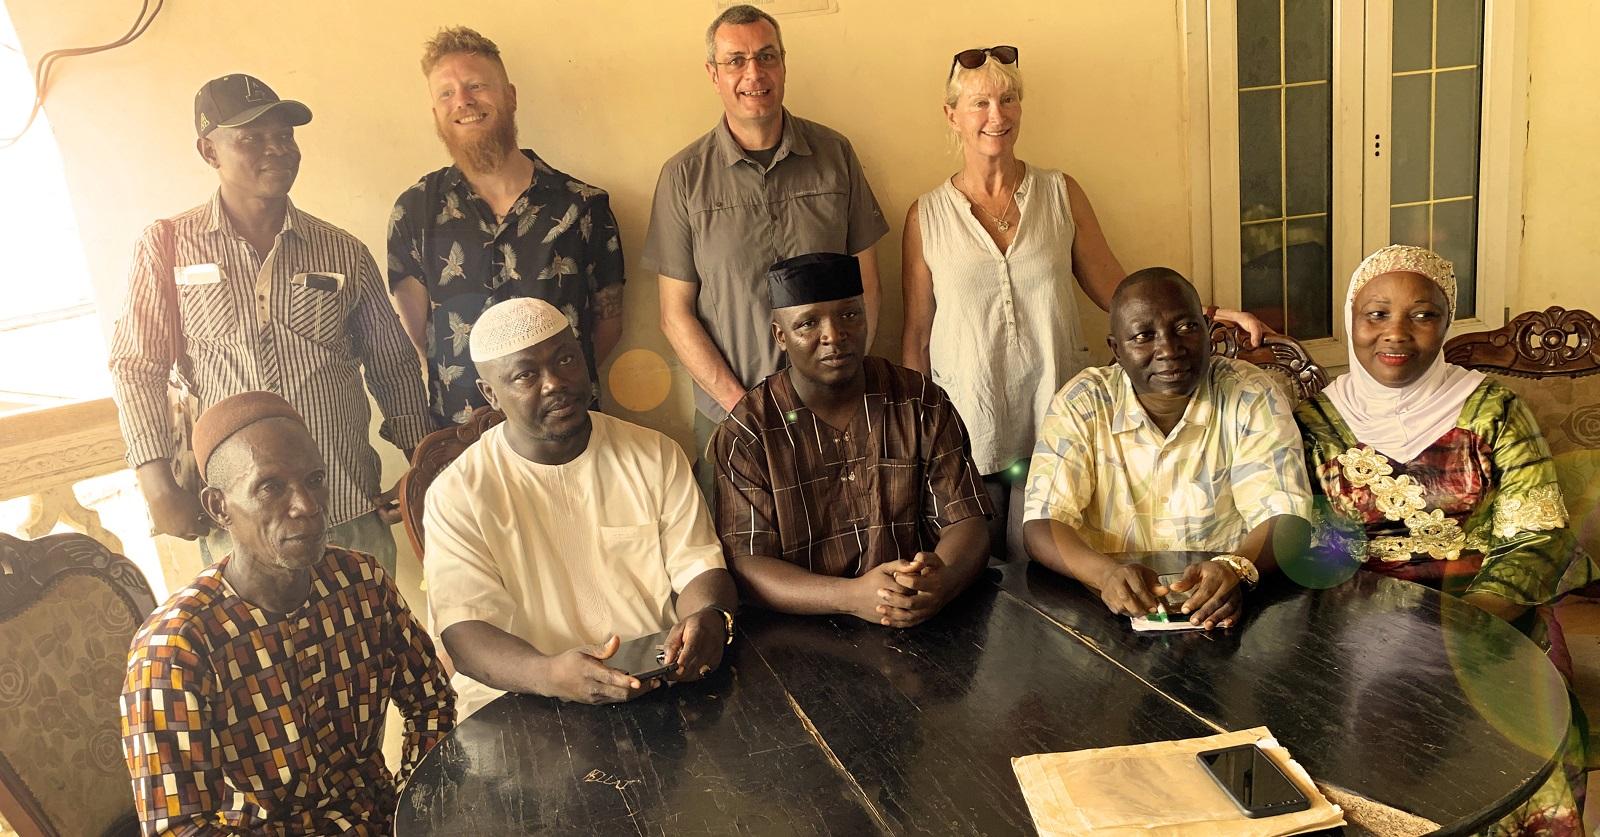 SOLAR IMPROVES MEDICAL CARE FOR THE POOREST IN SIERRA LEONE